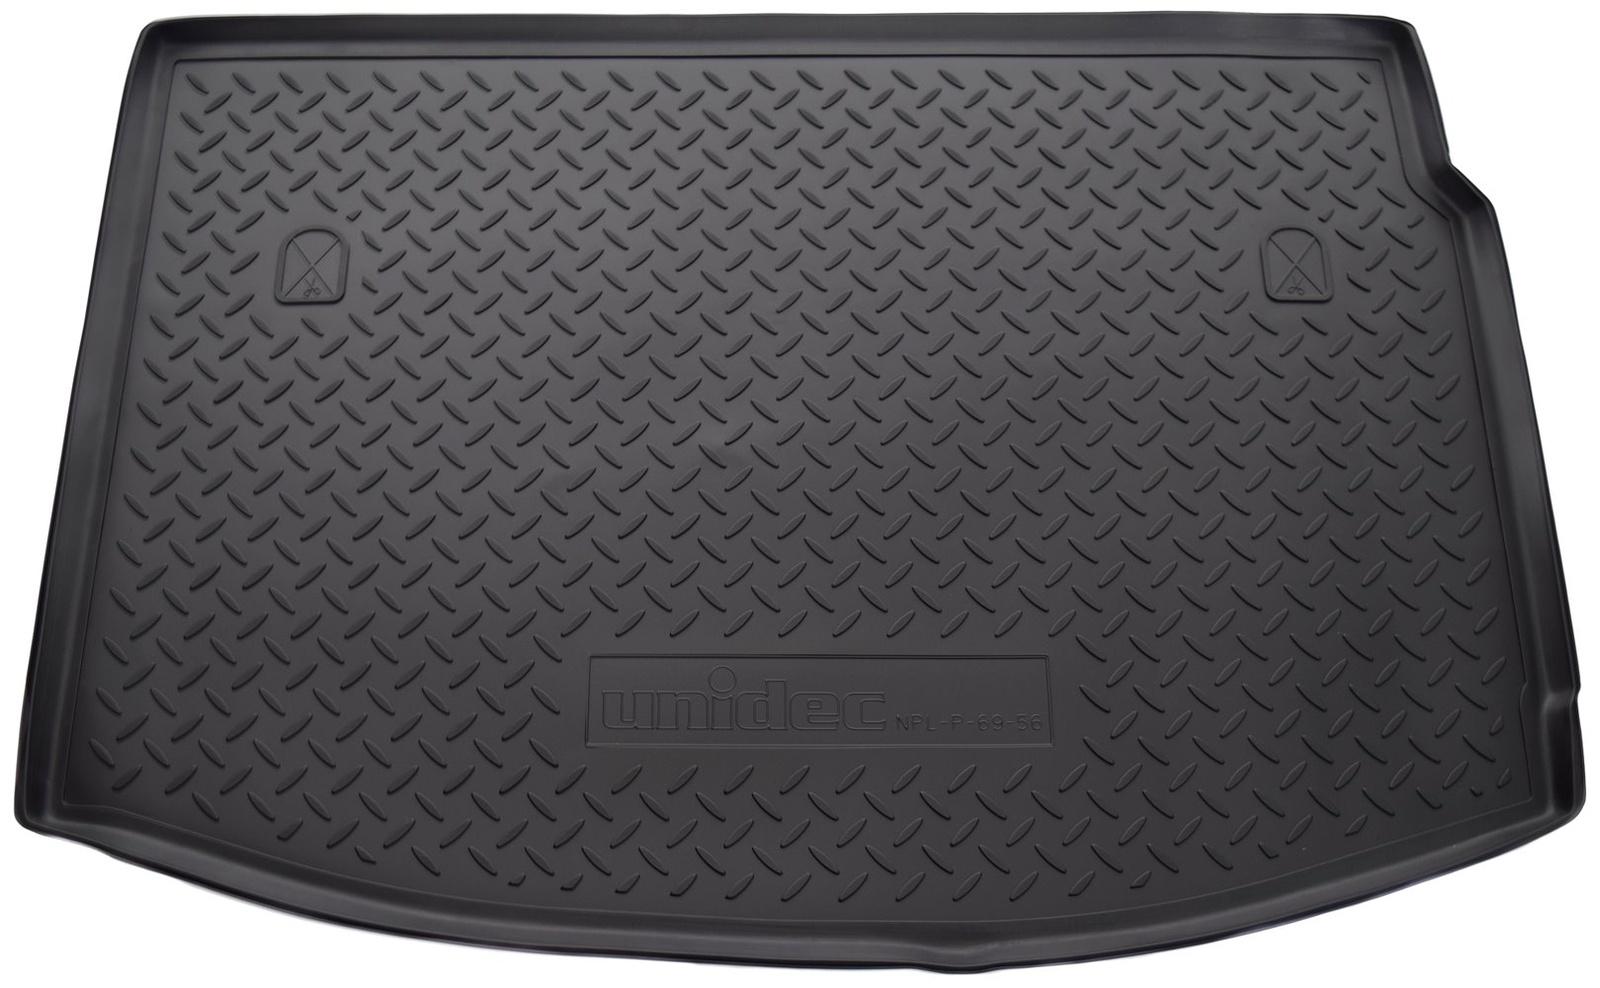 Коврик багажника для renault symbol (sd) (2006-2008) npl-p-69-68 коврик багажника полиуретан чёрный 2awd norplast npl p 69 04 для renault duster 2011